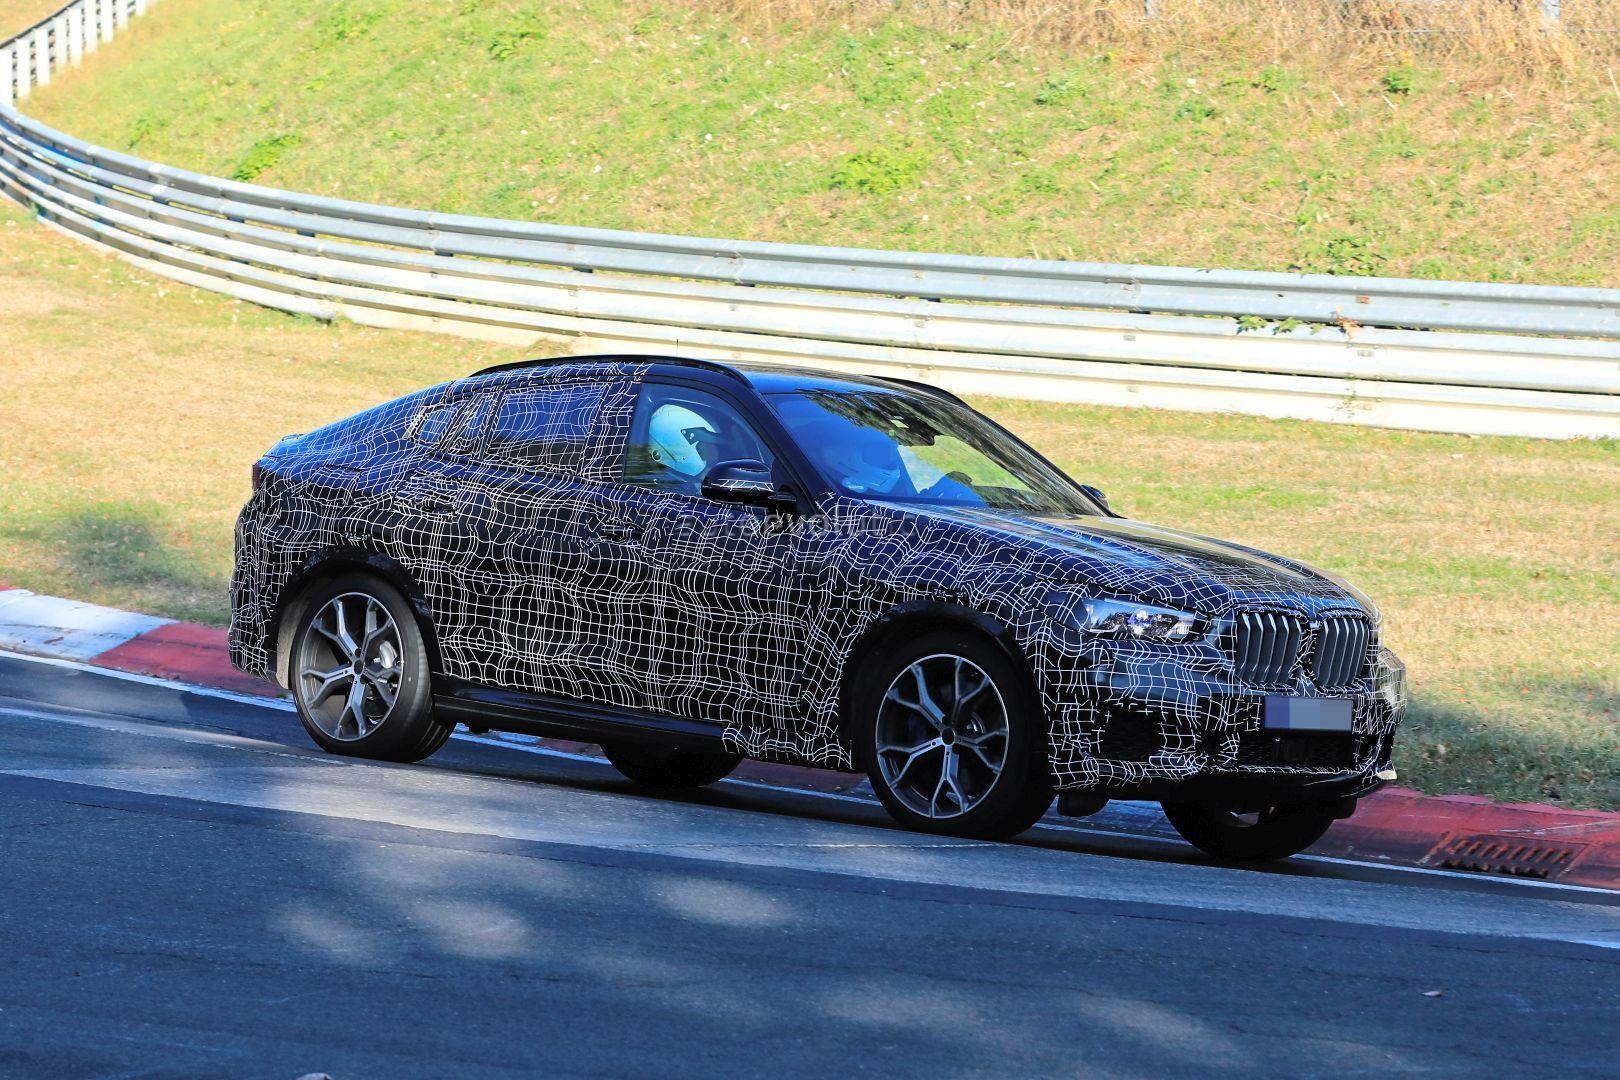 2020-bmw-x6-laps-nurburgring-prototype-reveals-sharper-look_5